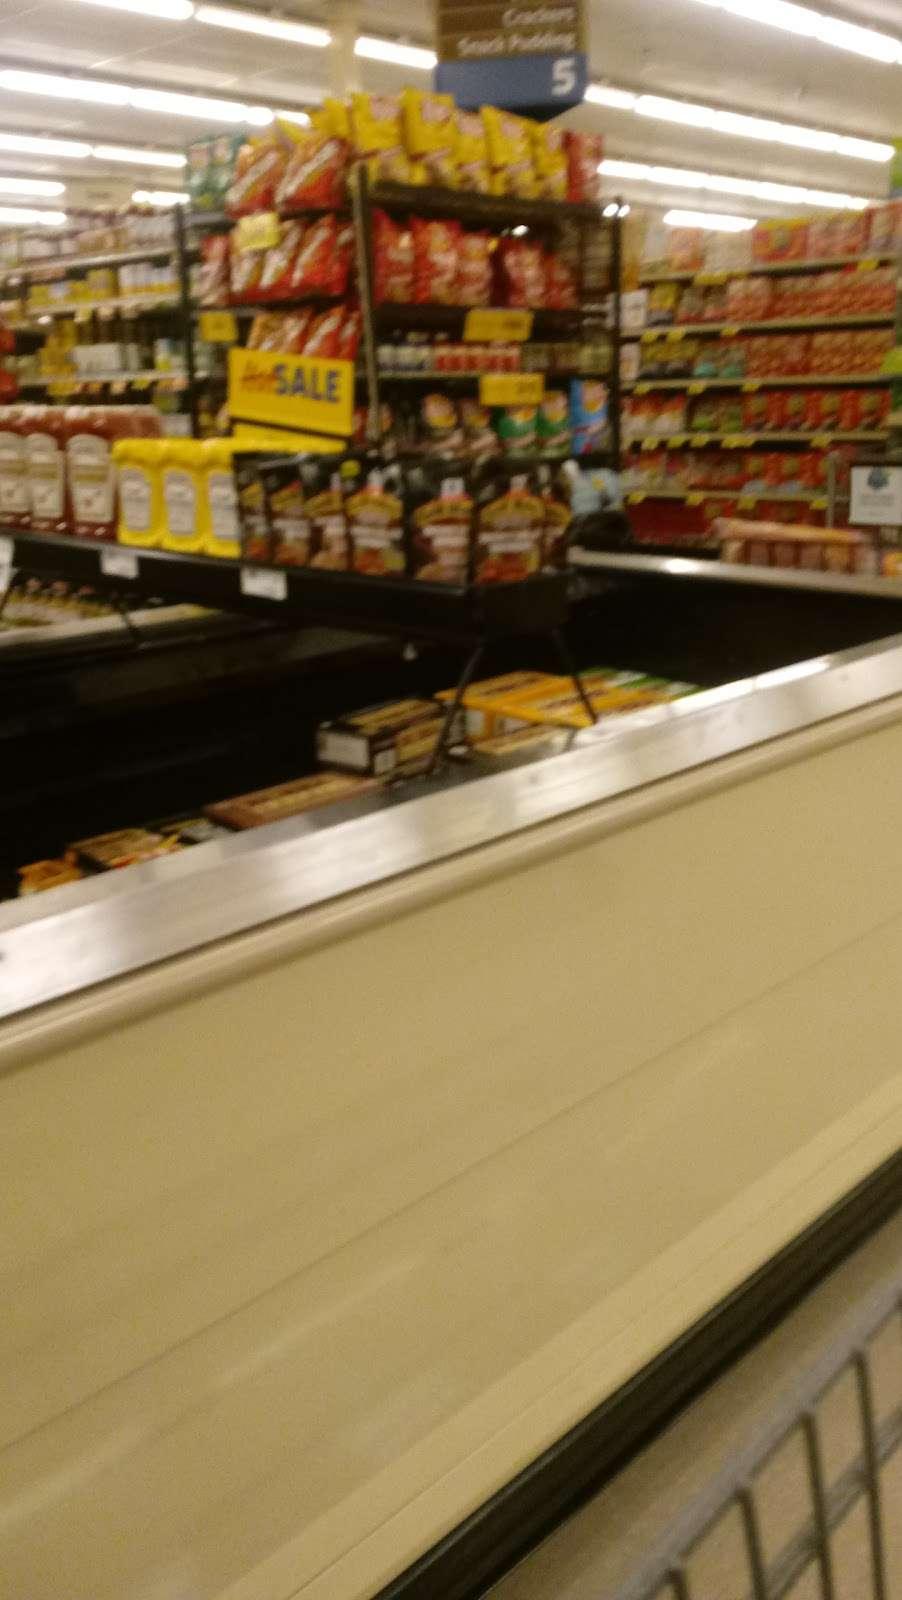 Food Lion - store  | Photo 6 of 10 | Address: 709 E McGregor St, Pageland, SC 29728, USA | Phone: (843) 672-7677